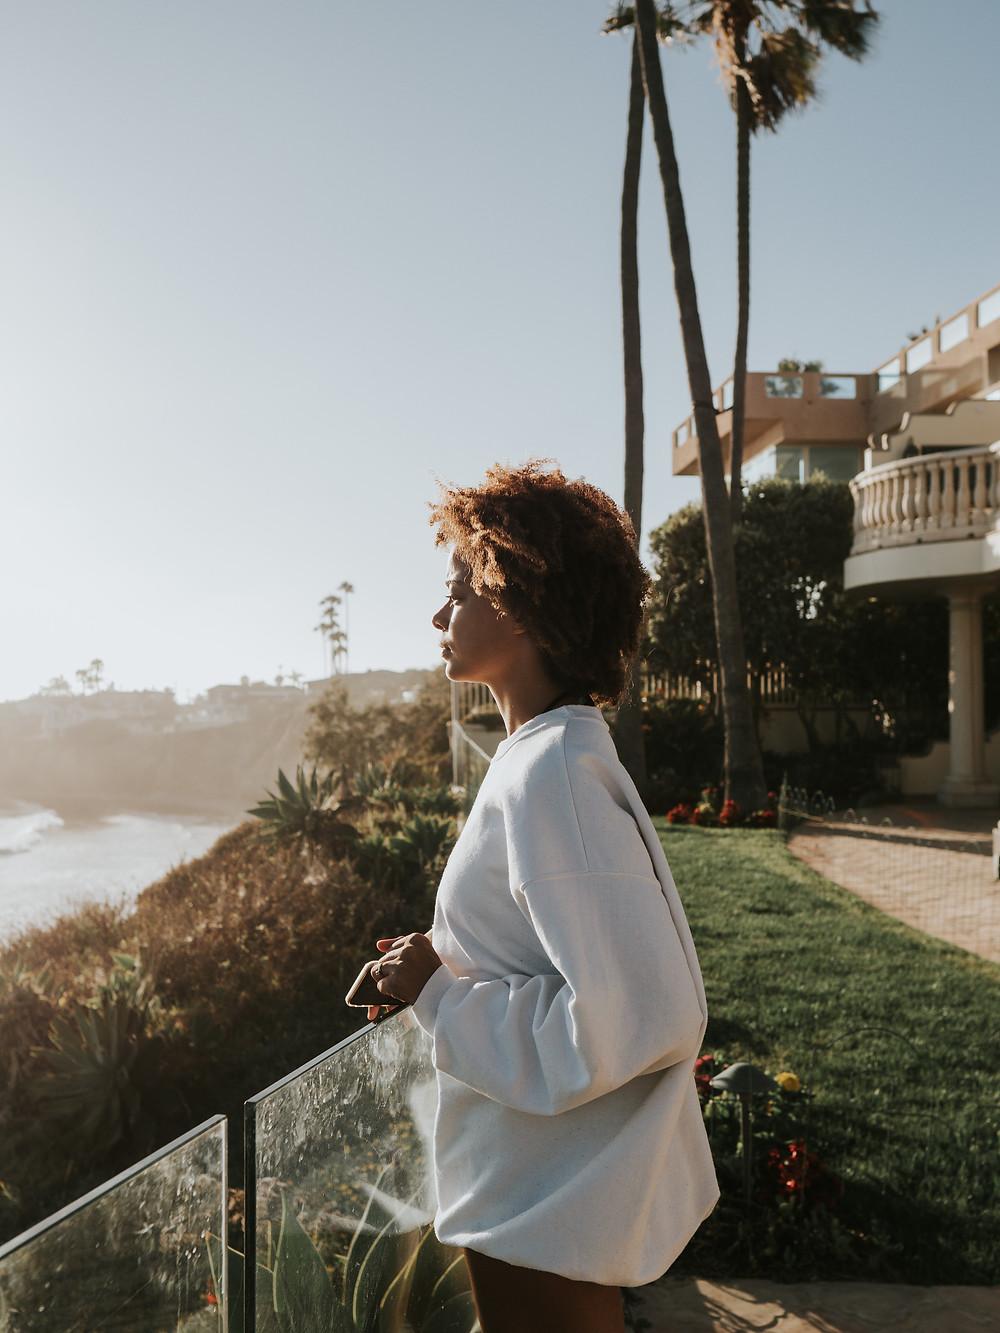 woman enjoying workcation by the beach in La Jolla california